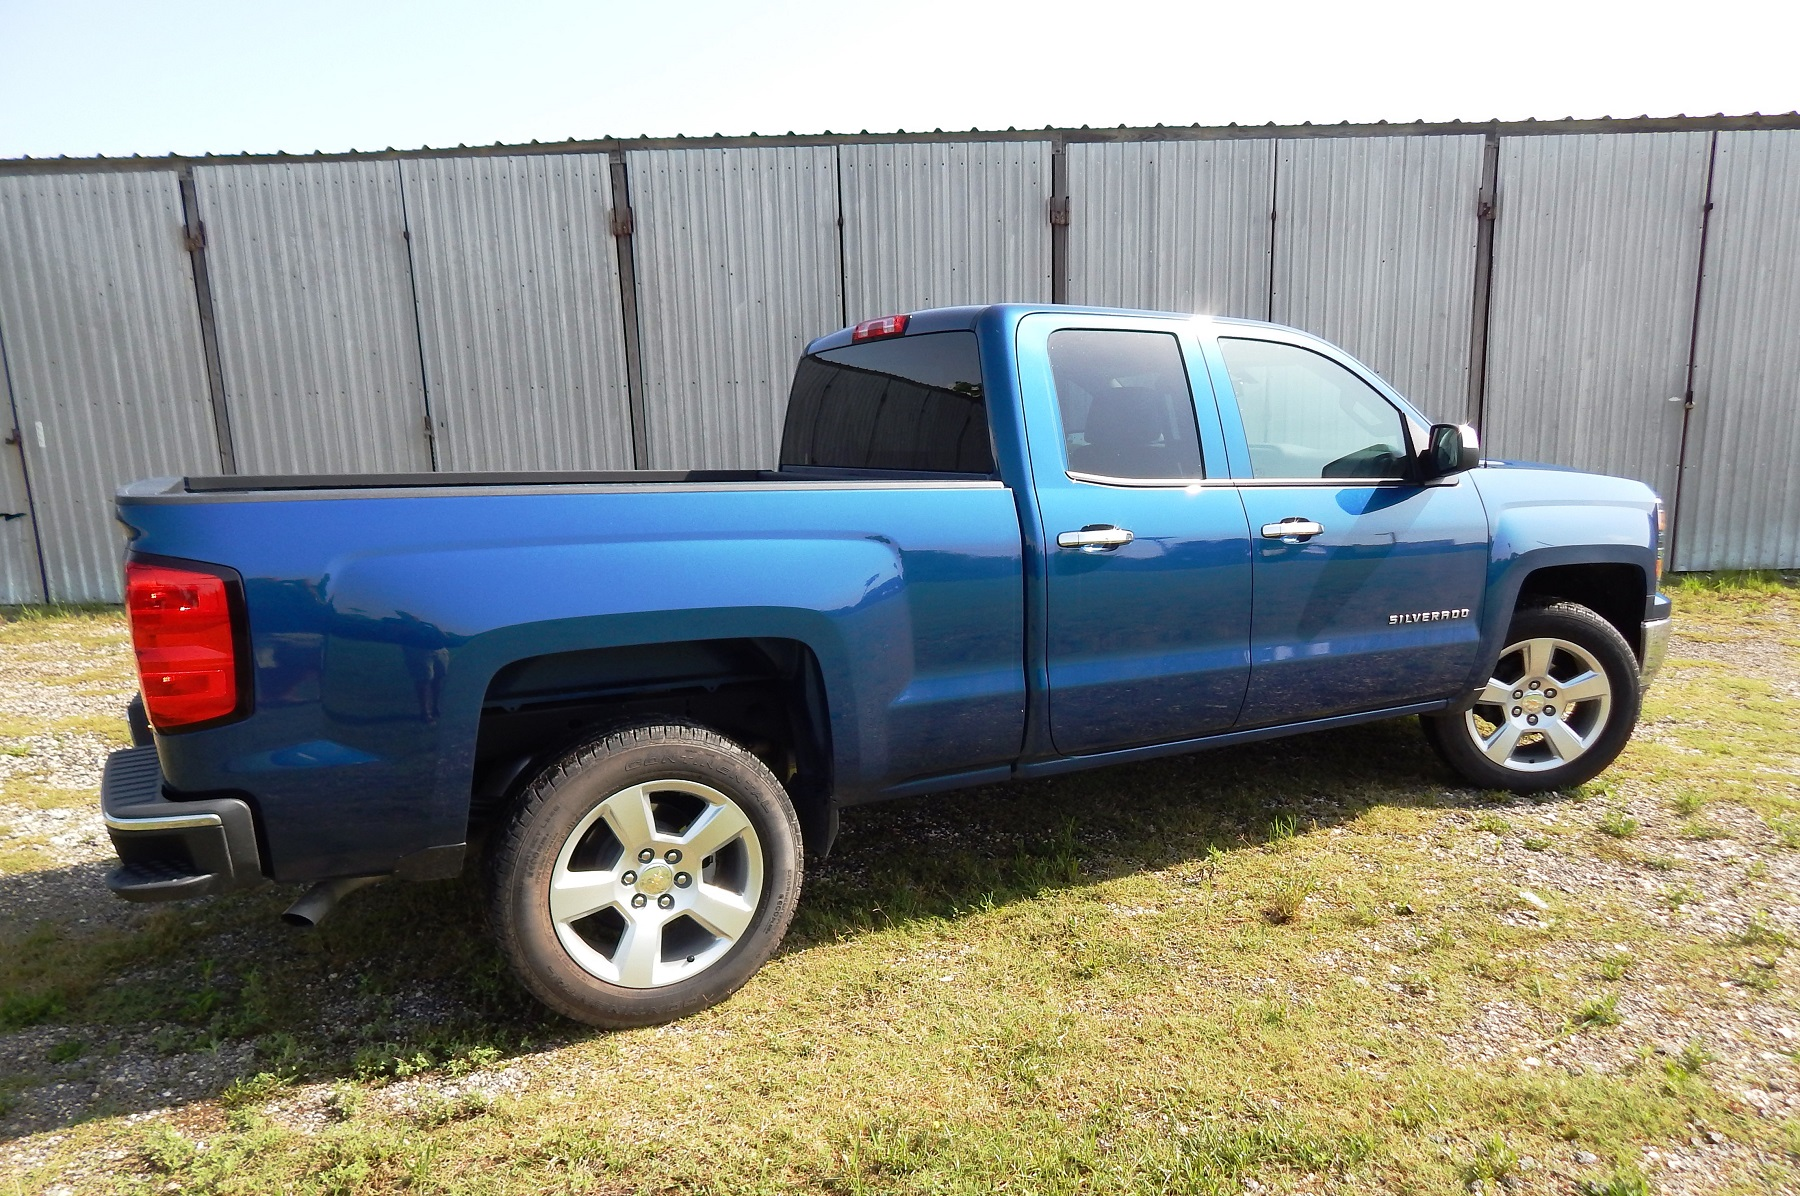 Chevy Silverado: New Stripped Pickup - Truck Talk - - GrooveCar